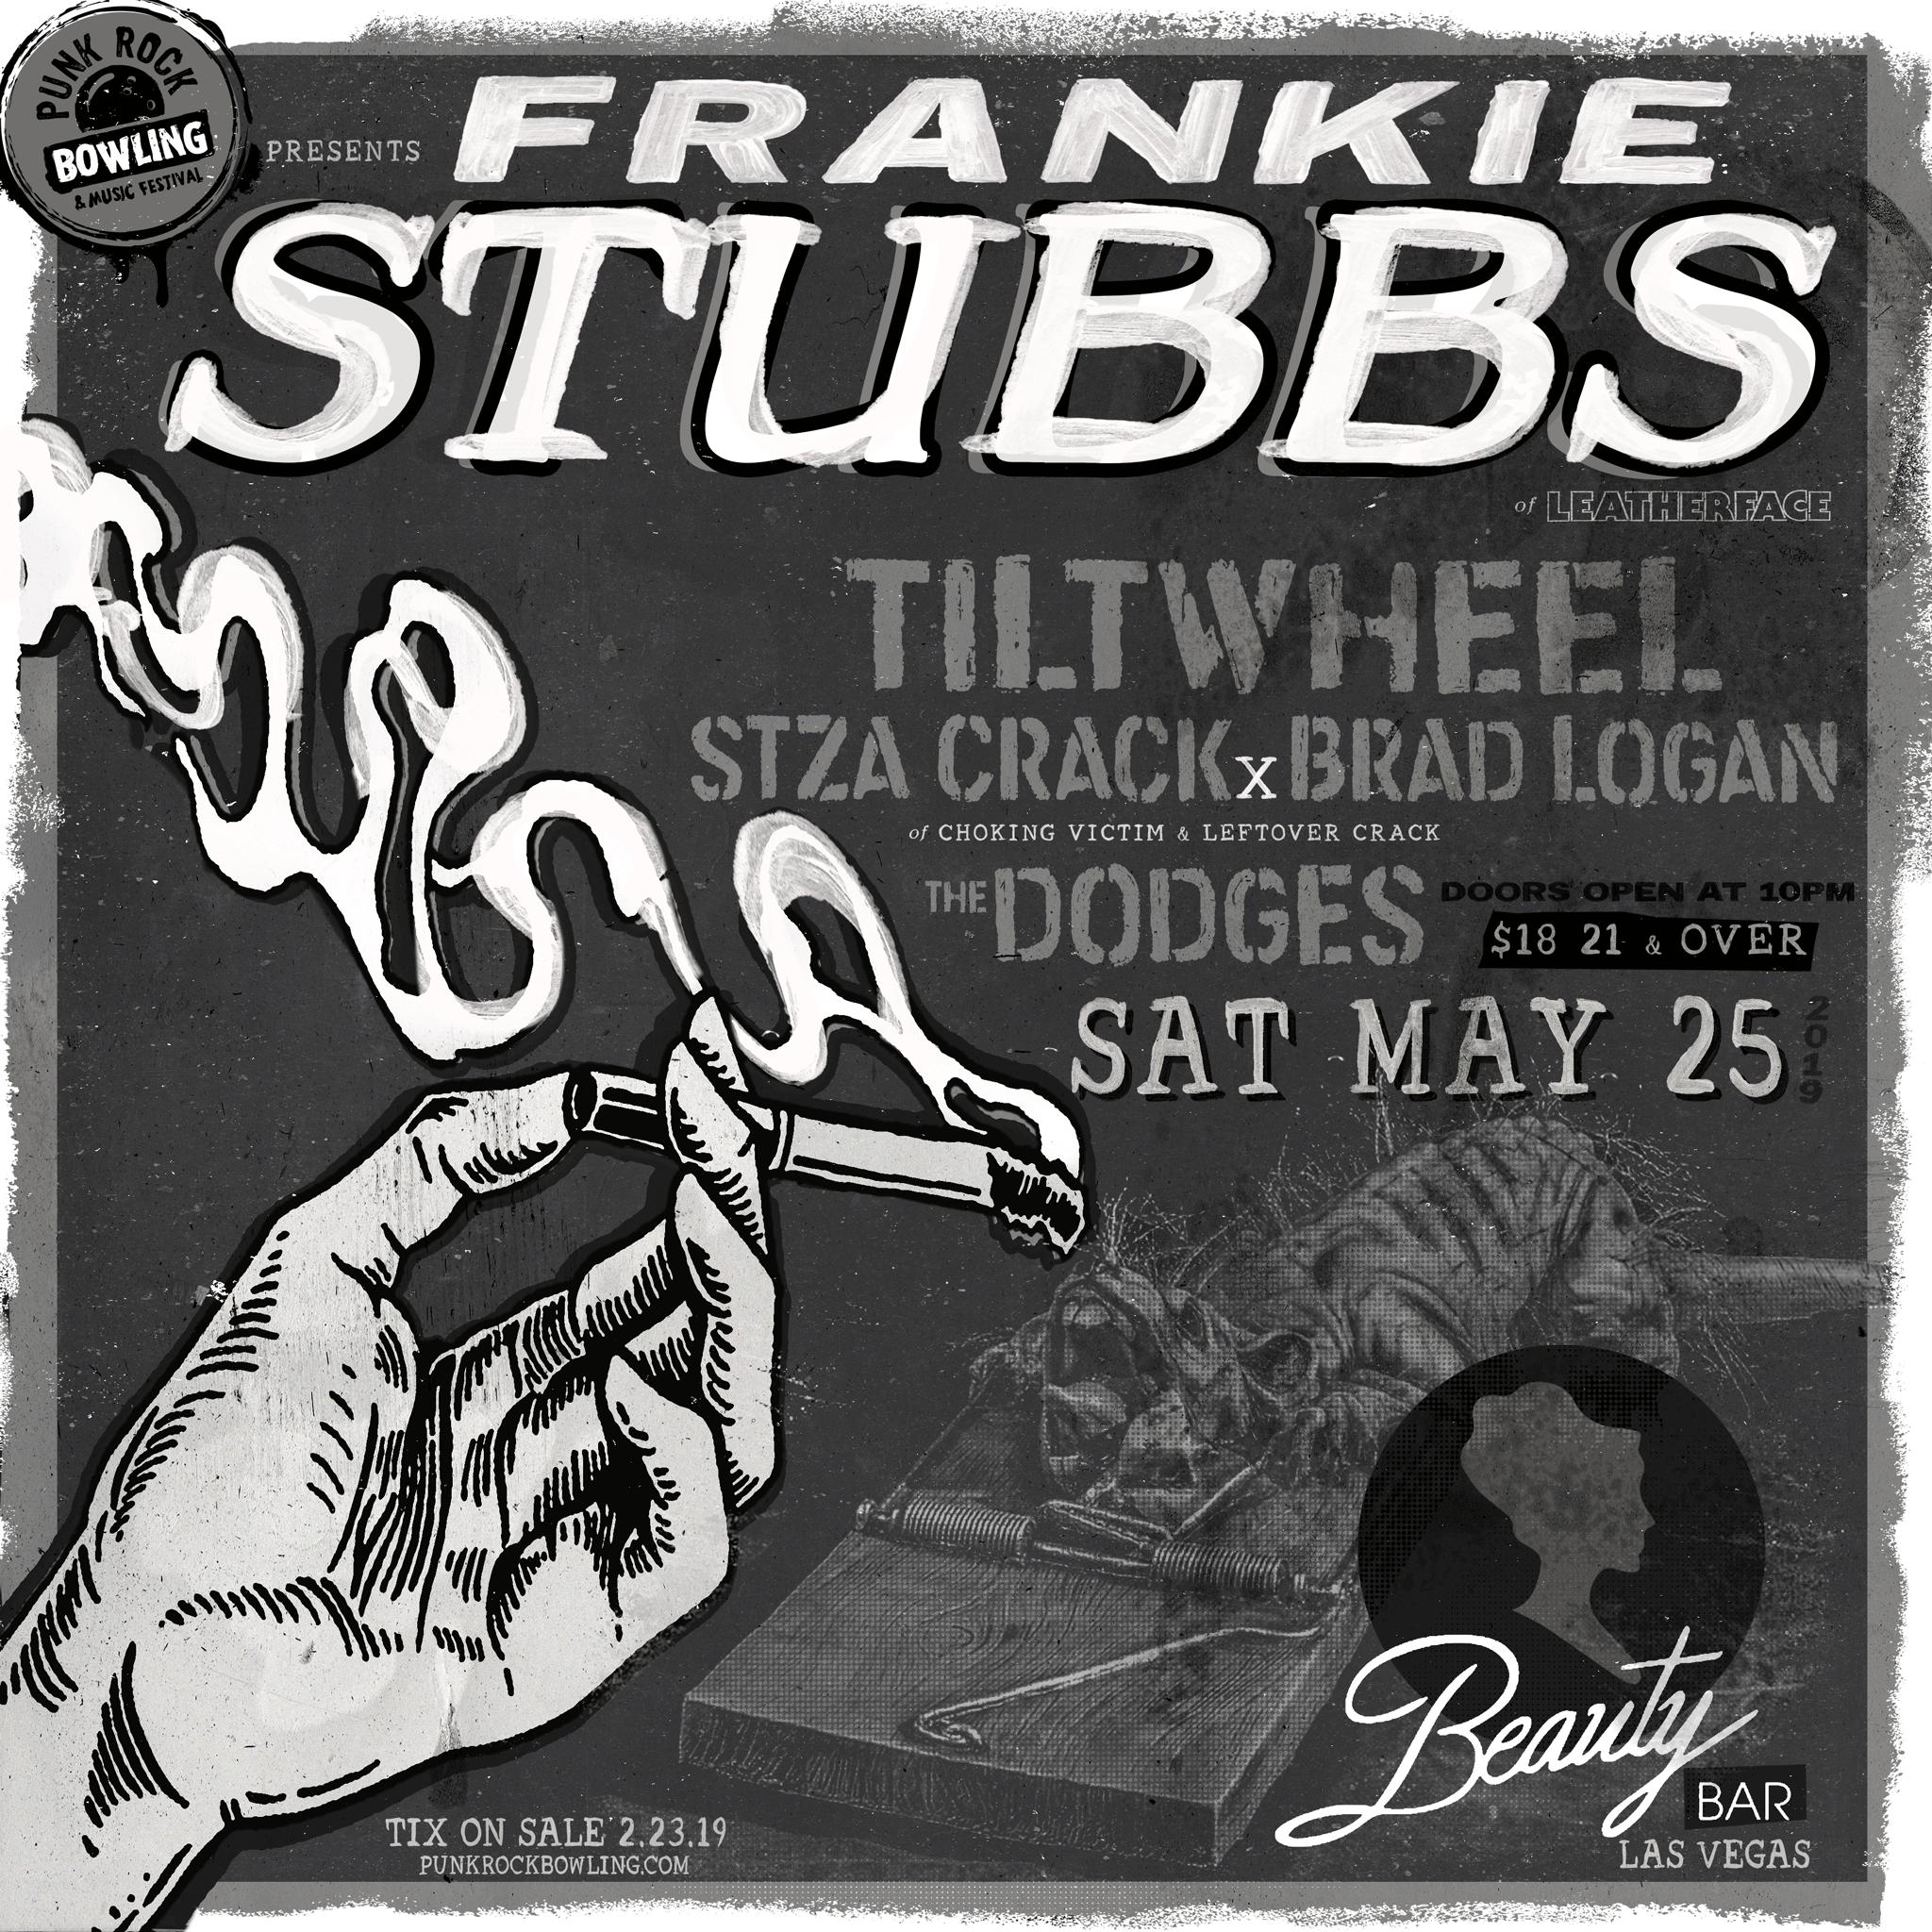 Frankie Stubbs Punk Rock Bowling 2019 Club Show